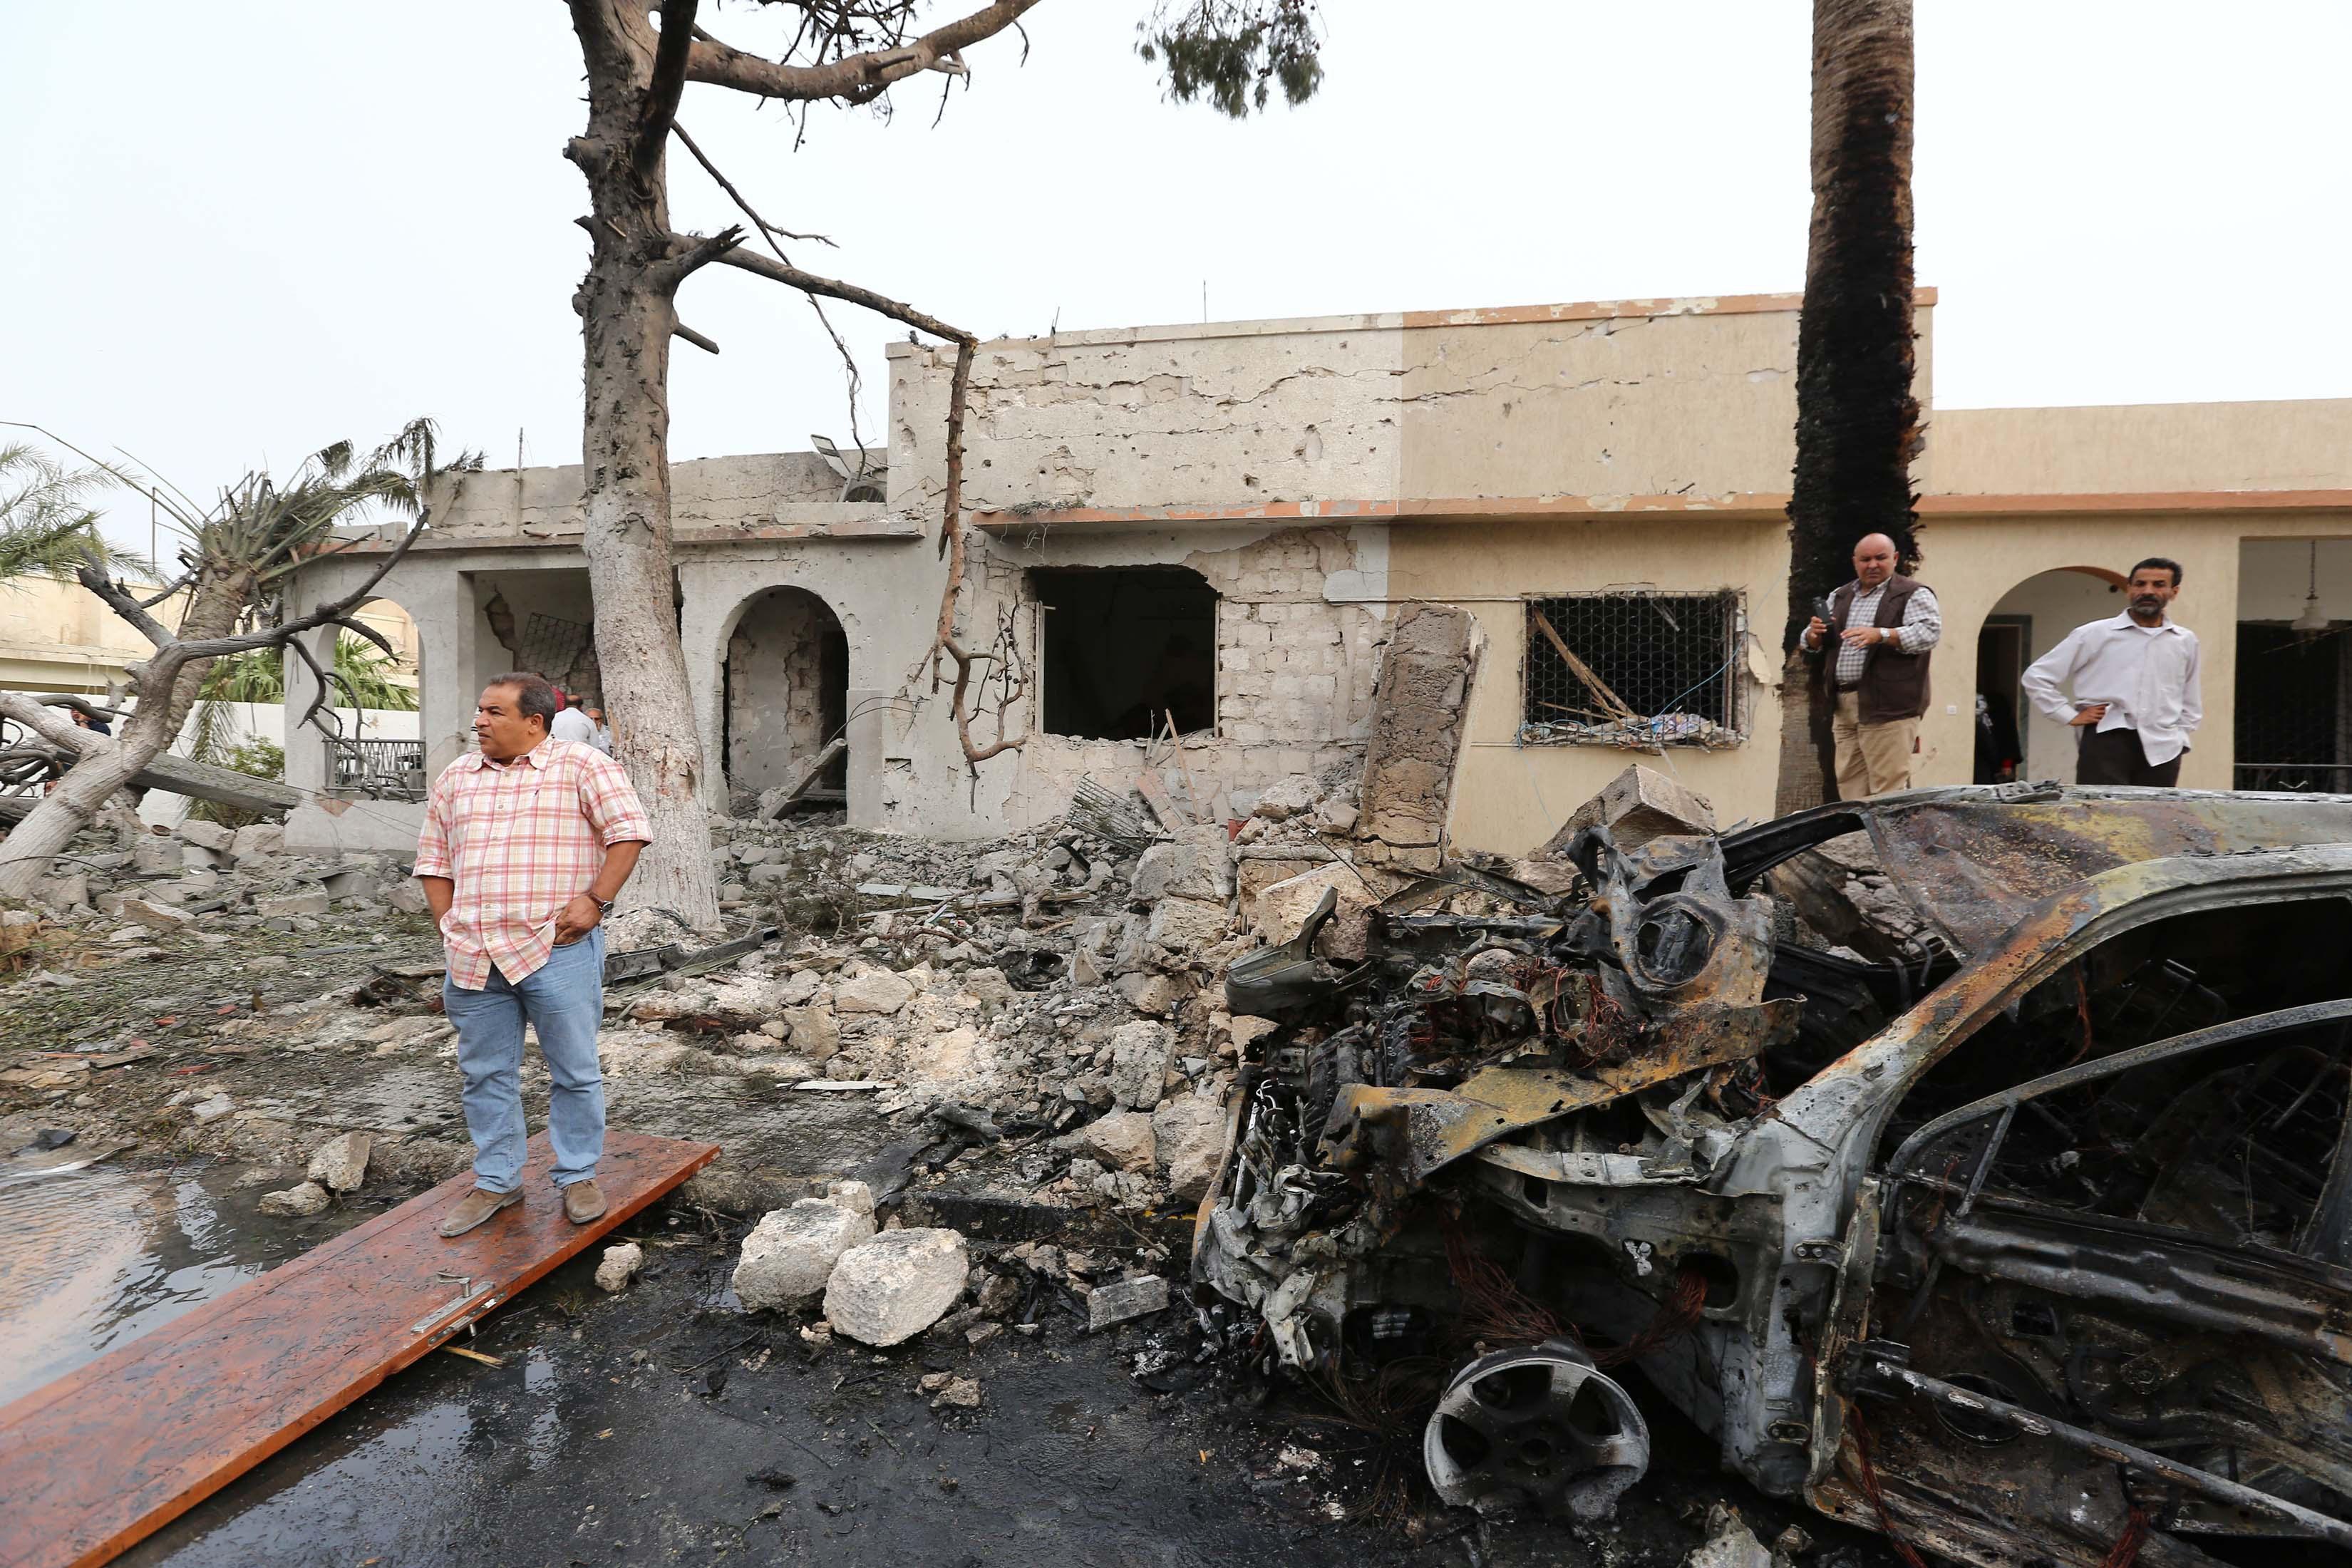 LIBYA-FRANCE-UNREST-EMBASSY